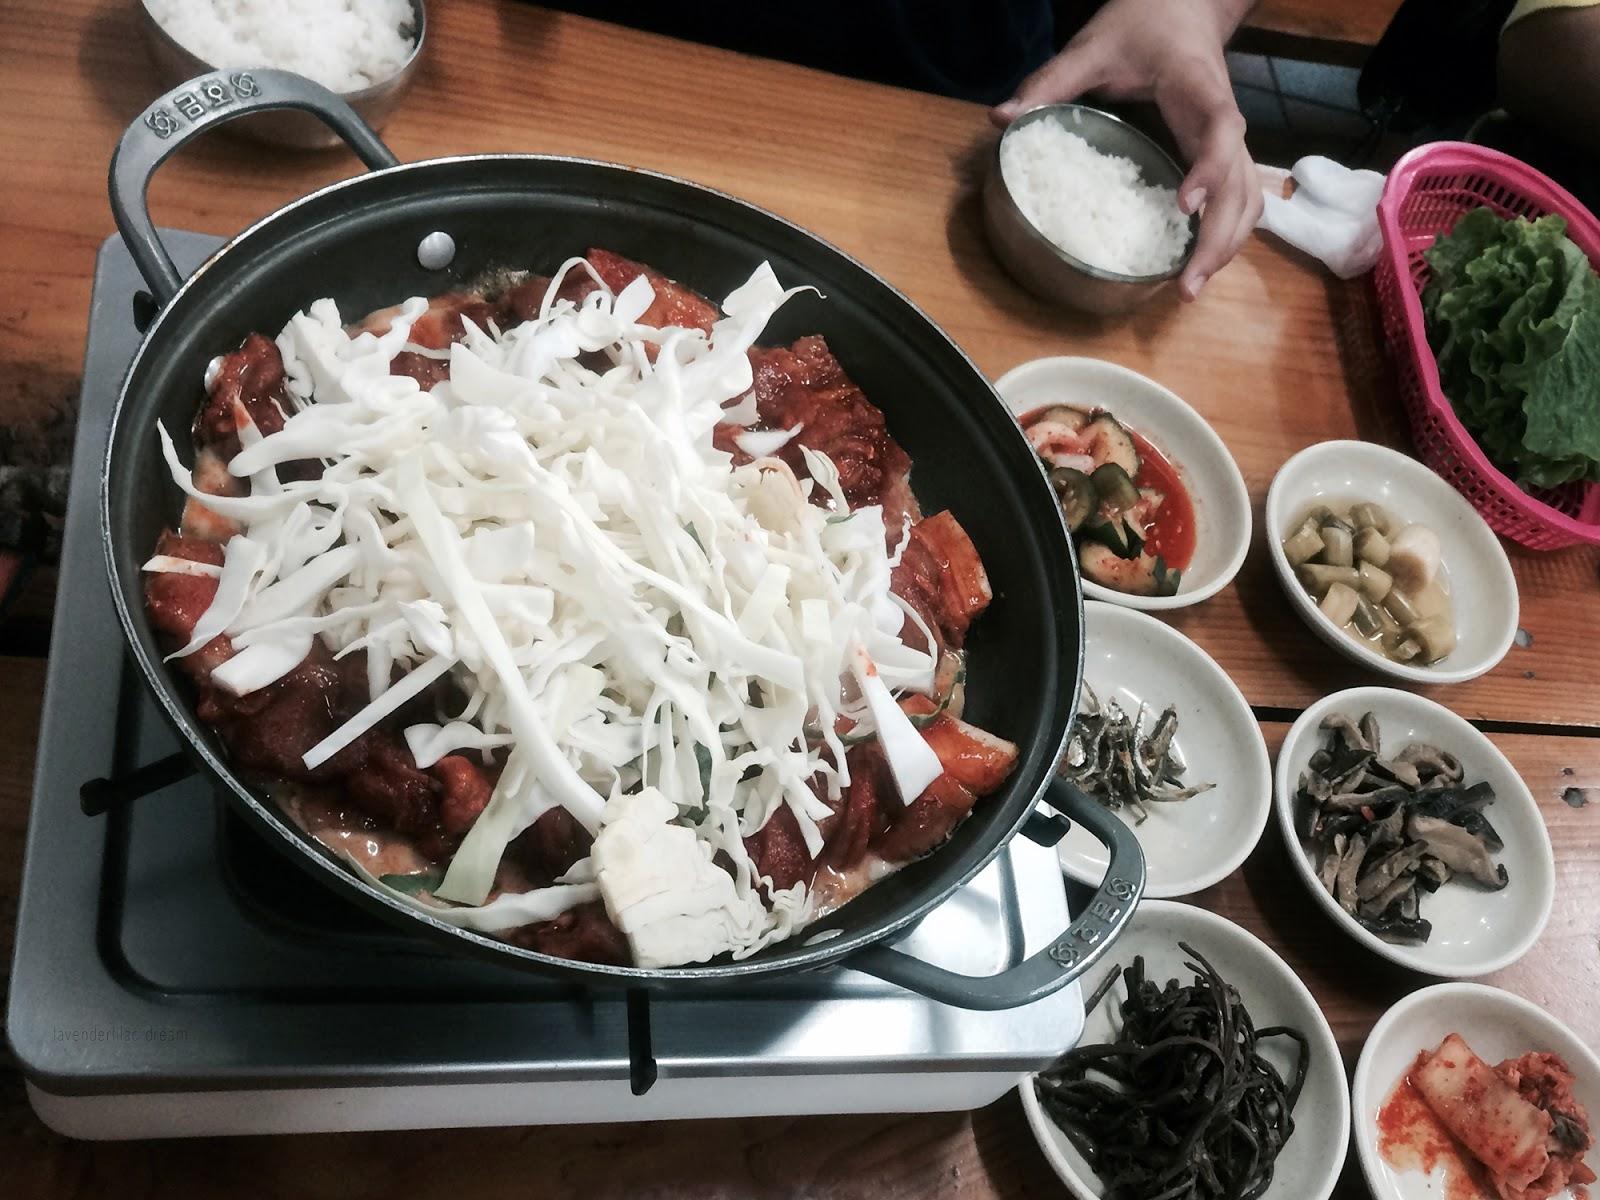 South Korea, Jeju Island, Yonsei University, YISS 2014, Spicy pork lunch